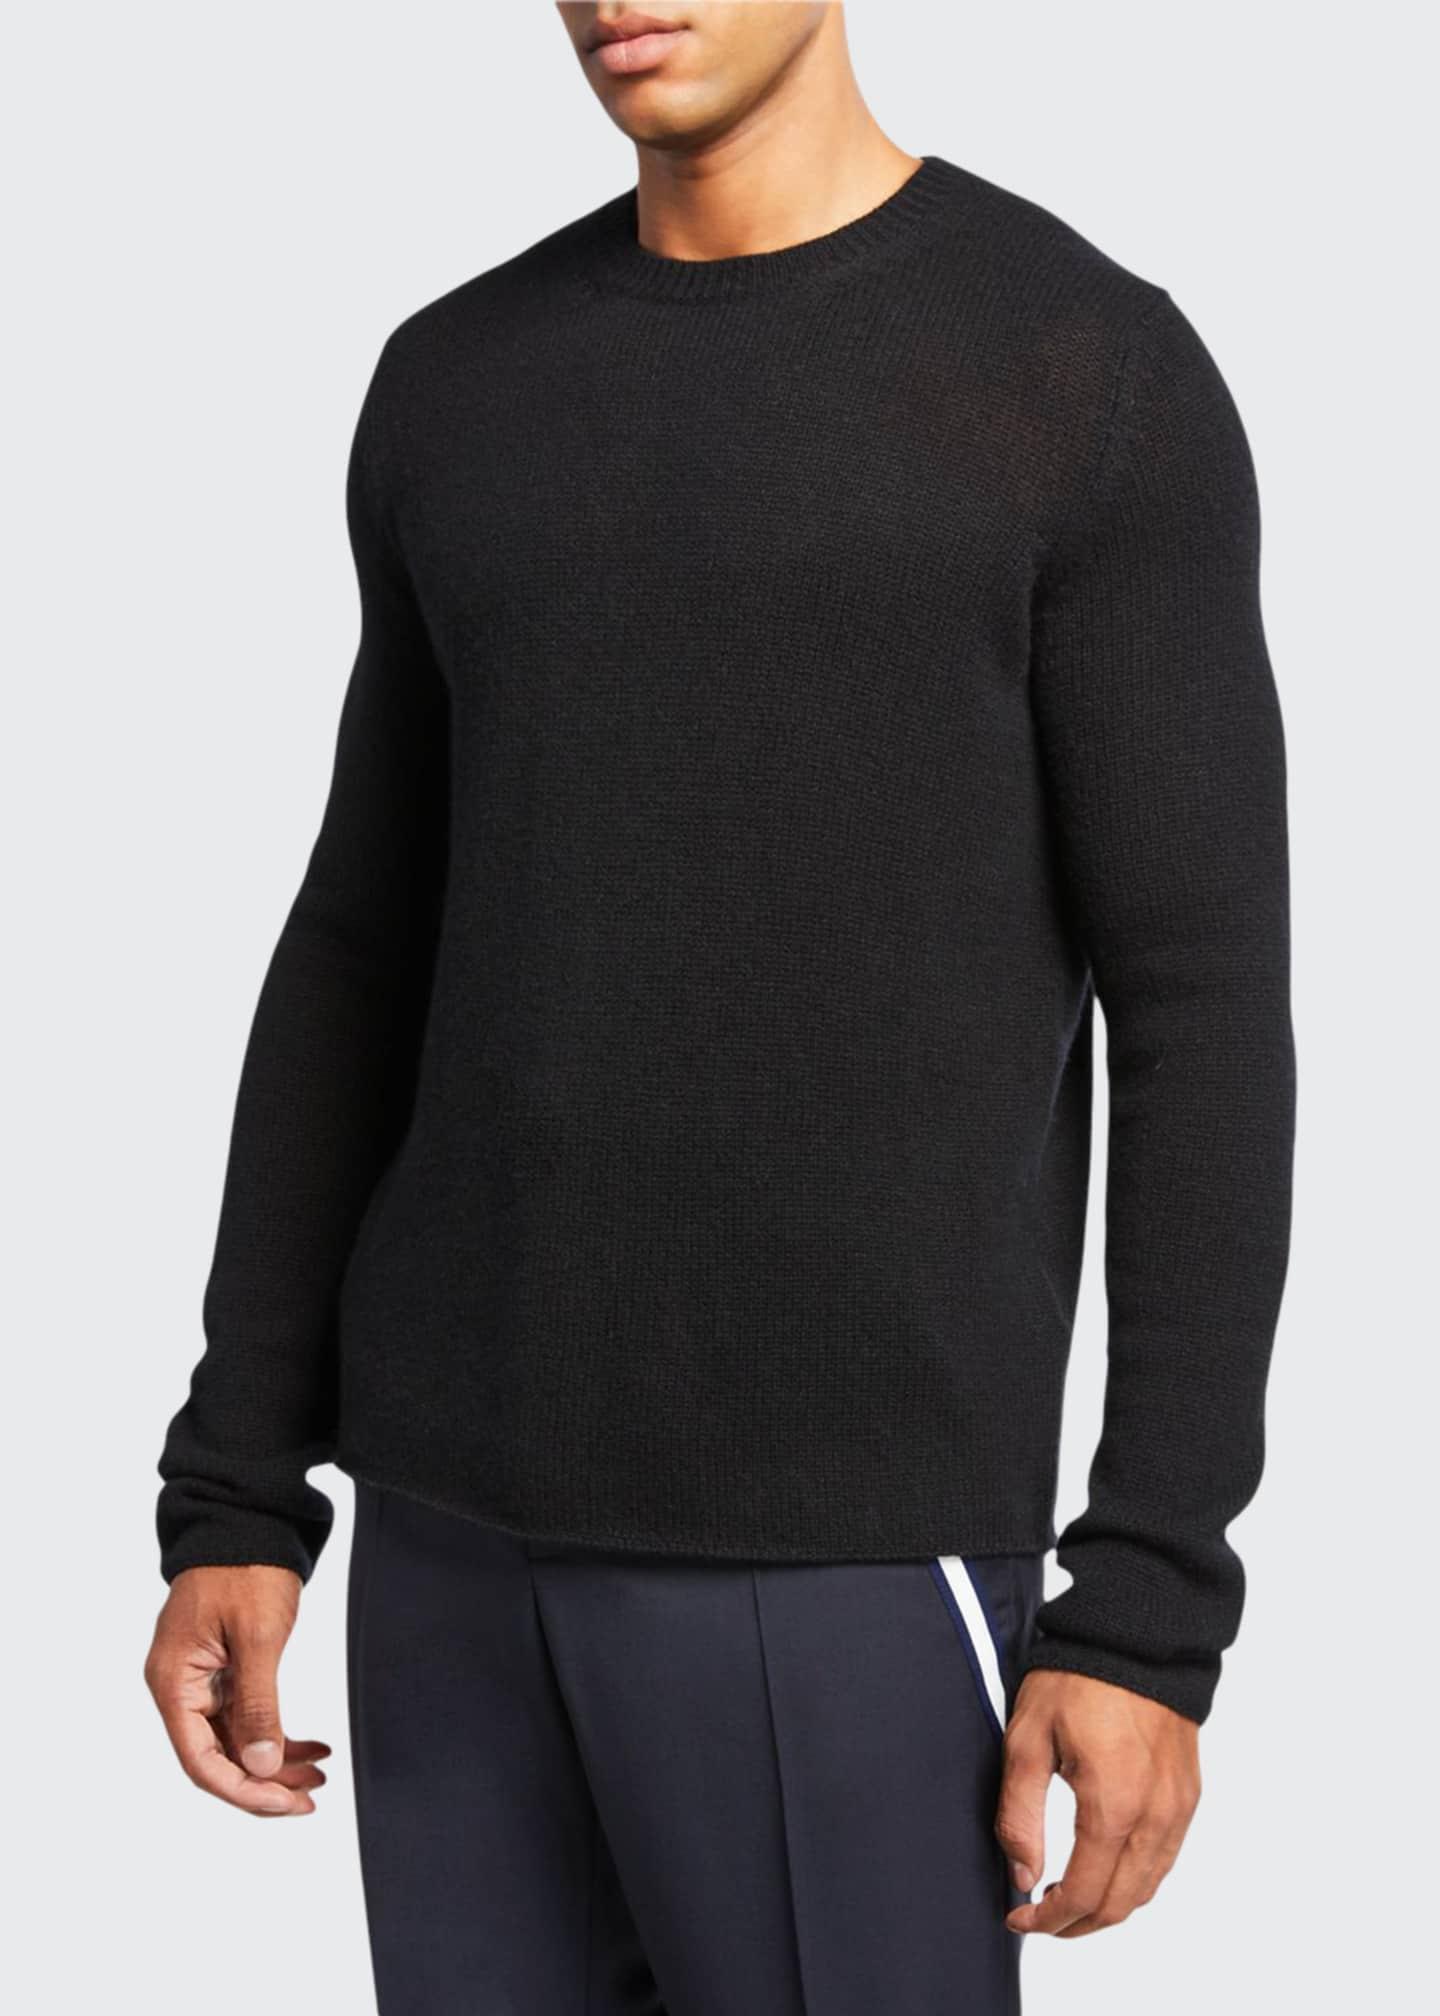 Bottega Veneta Men's Soft Cashmere Sweater